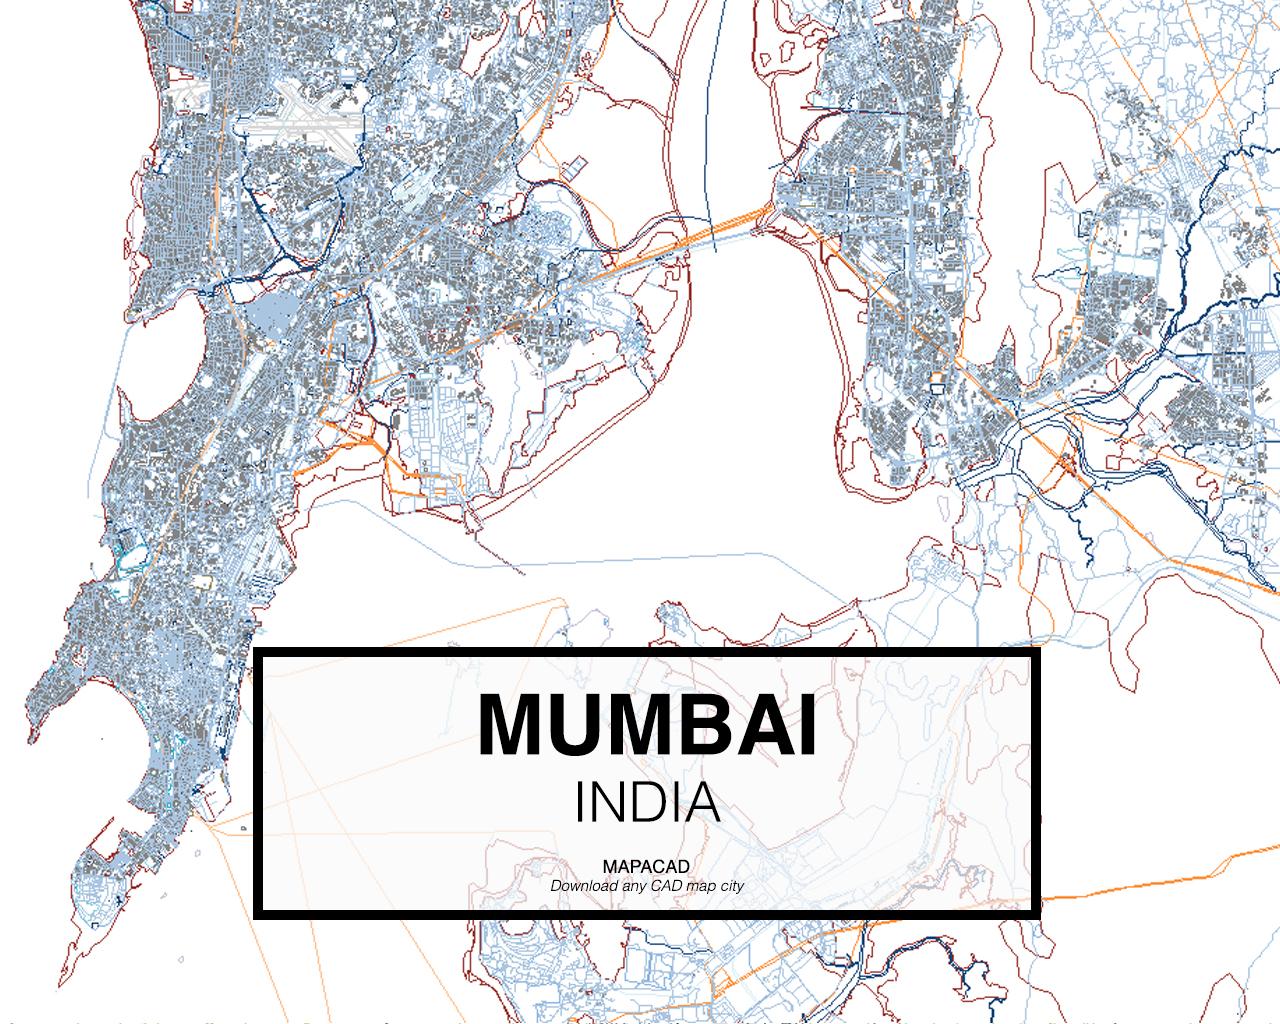 Mumbai On Map Of Asia.Download Mumbai Dwg Mapacad